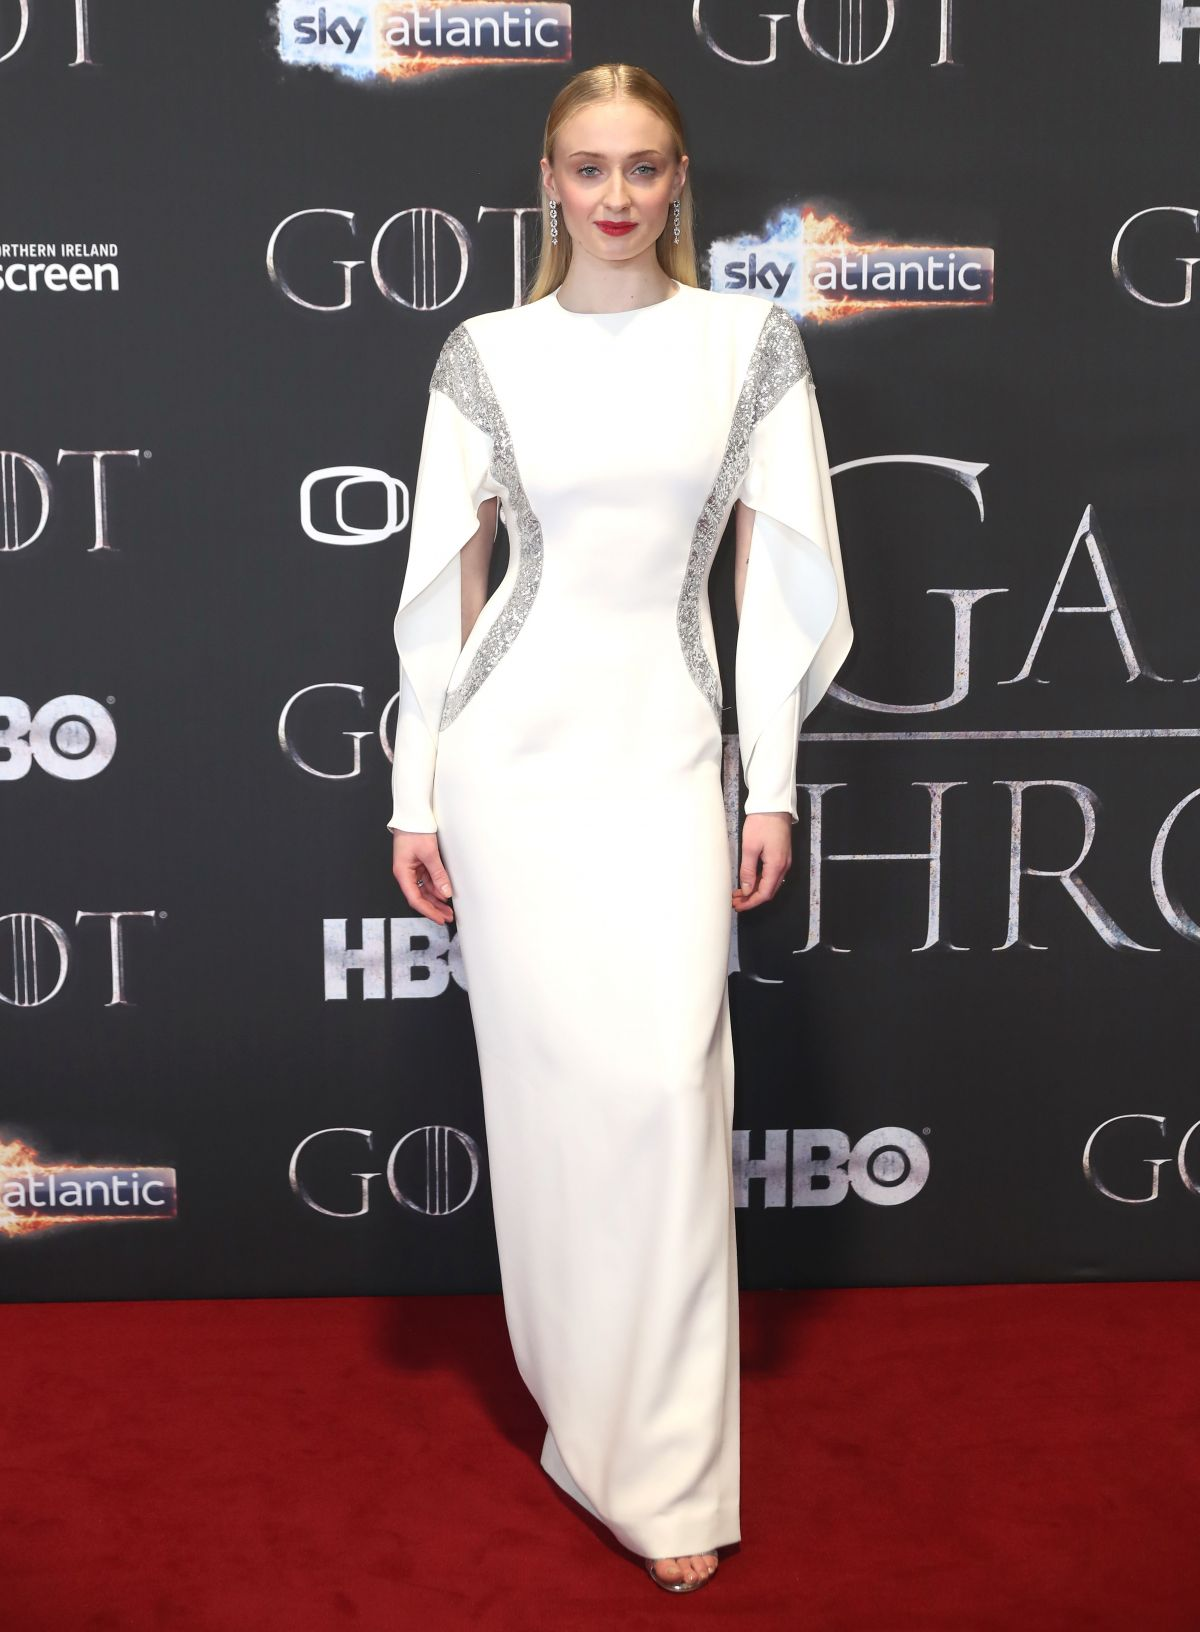 HBOs Game Of Thrones Season 5 Premiere - Red Carpet